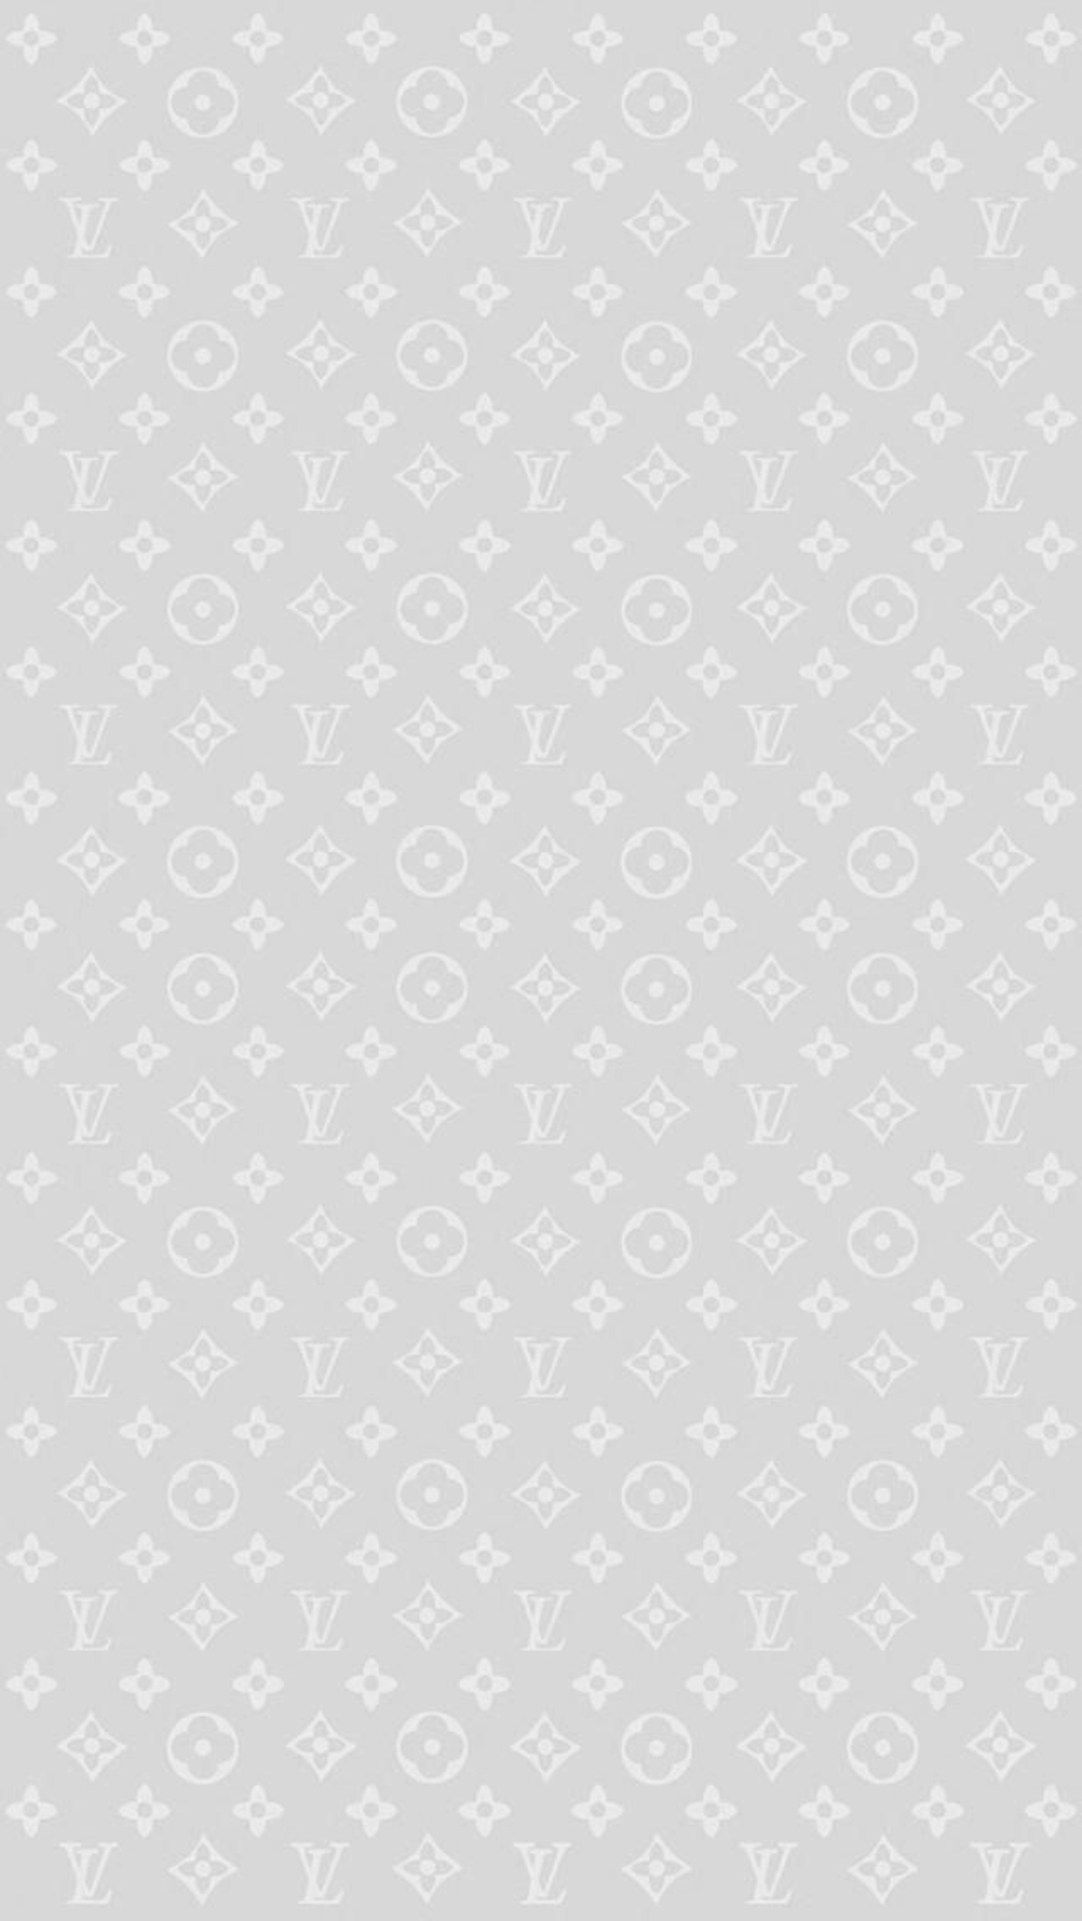 Louis Vuitton White Iphone Wallpapers On Wallpaperdog